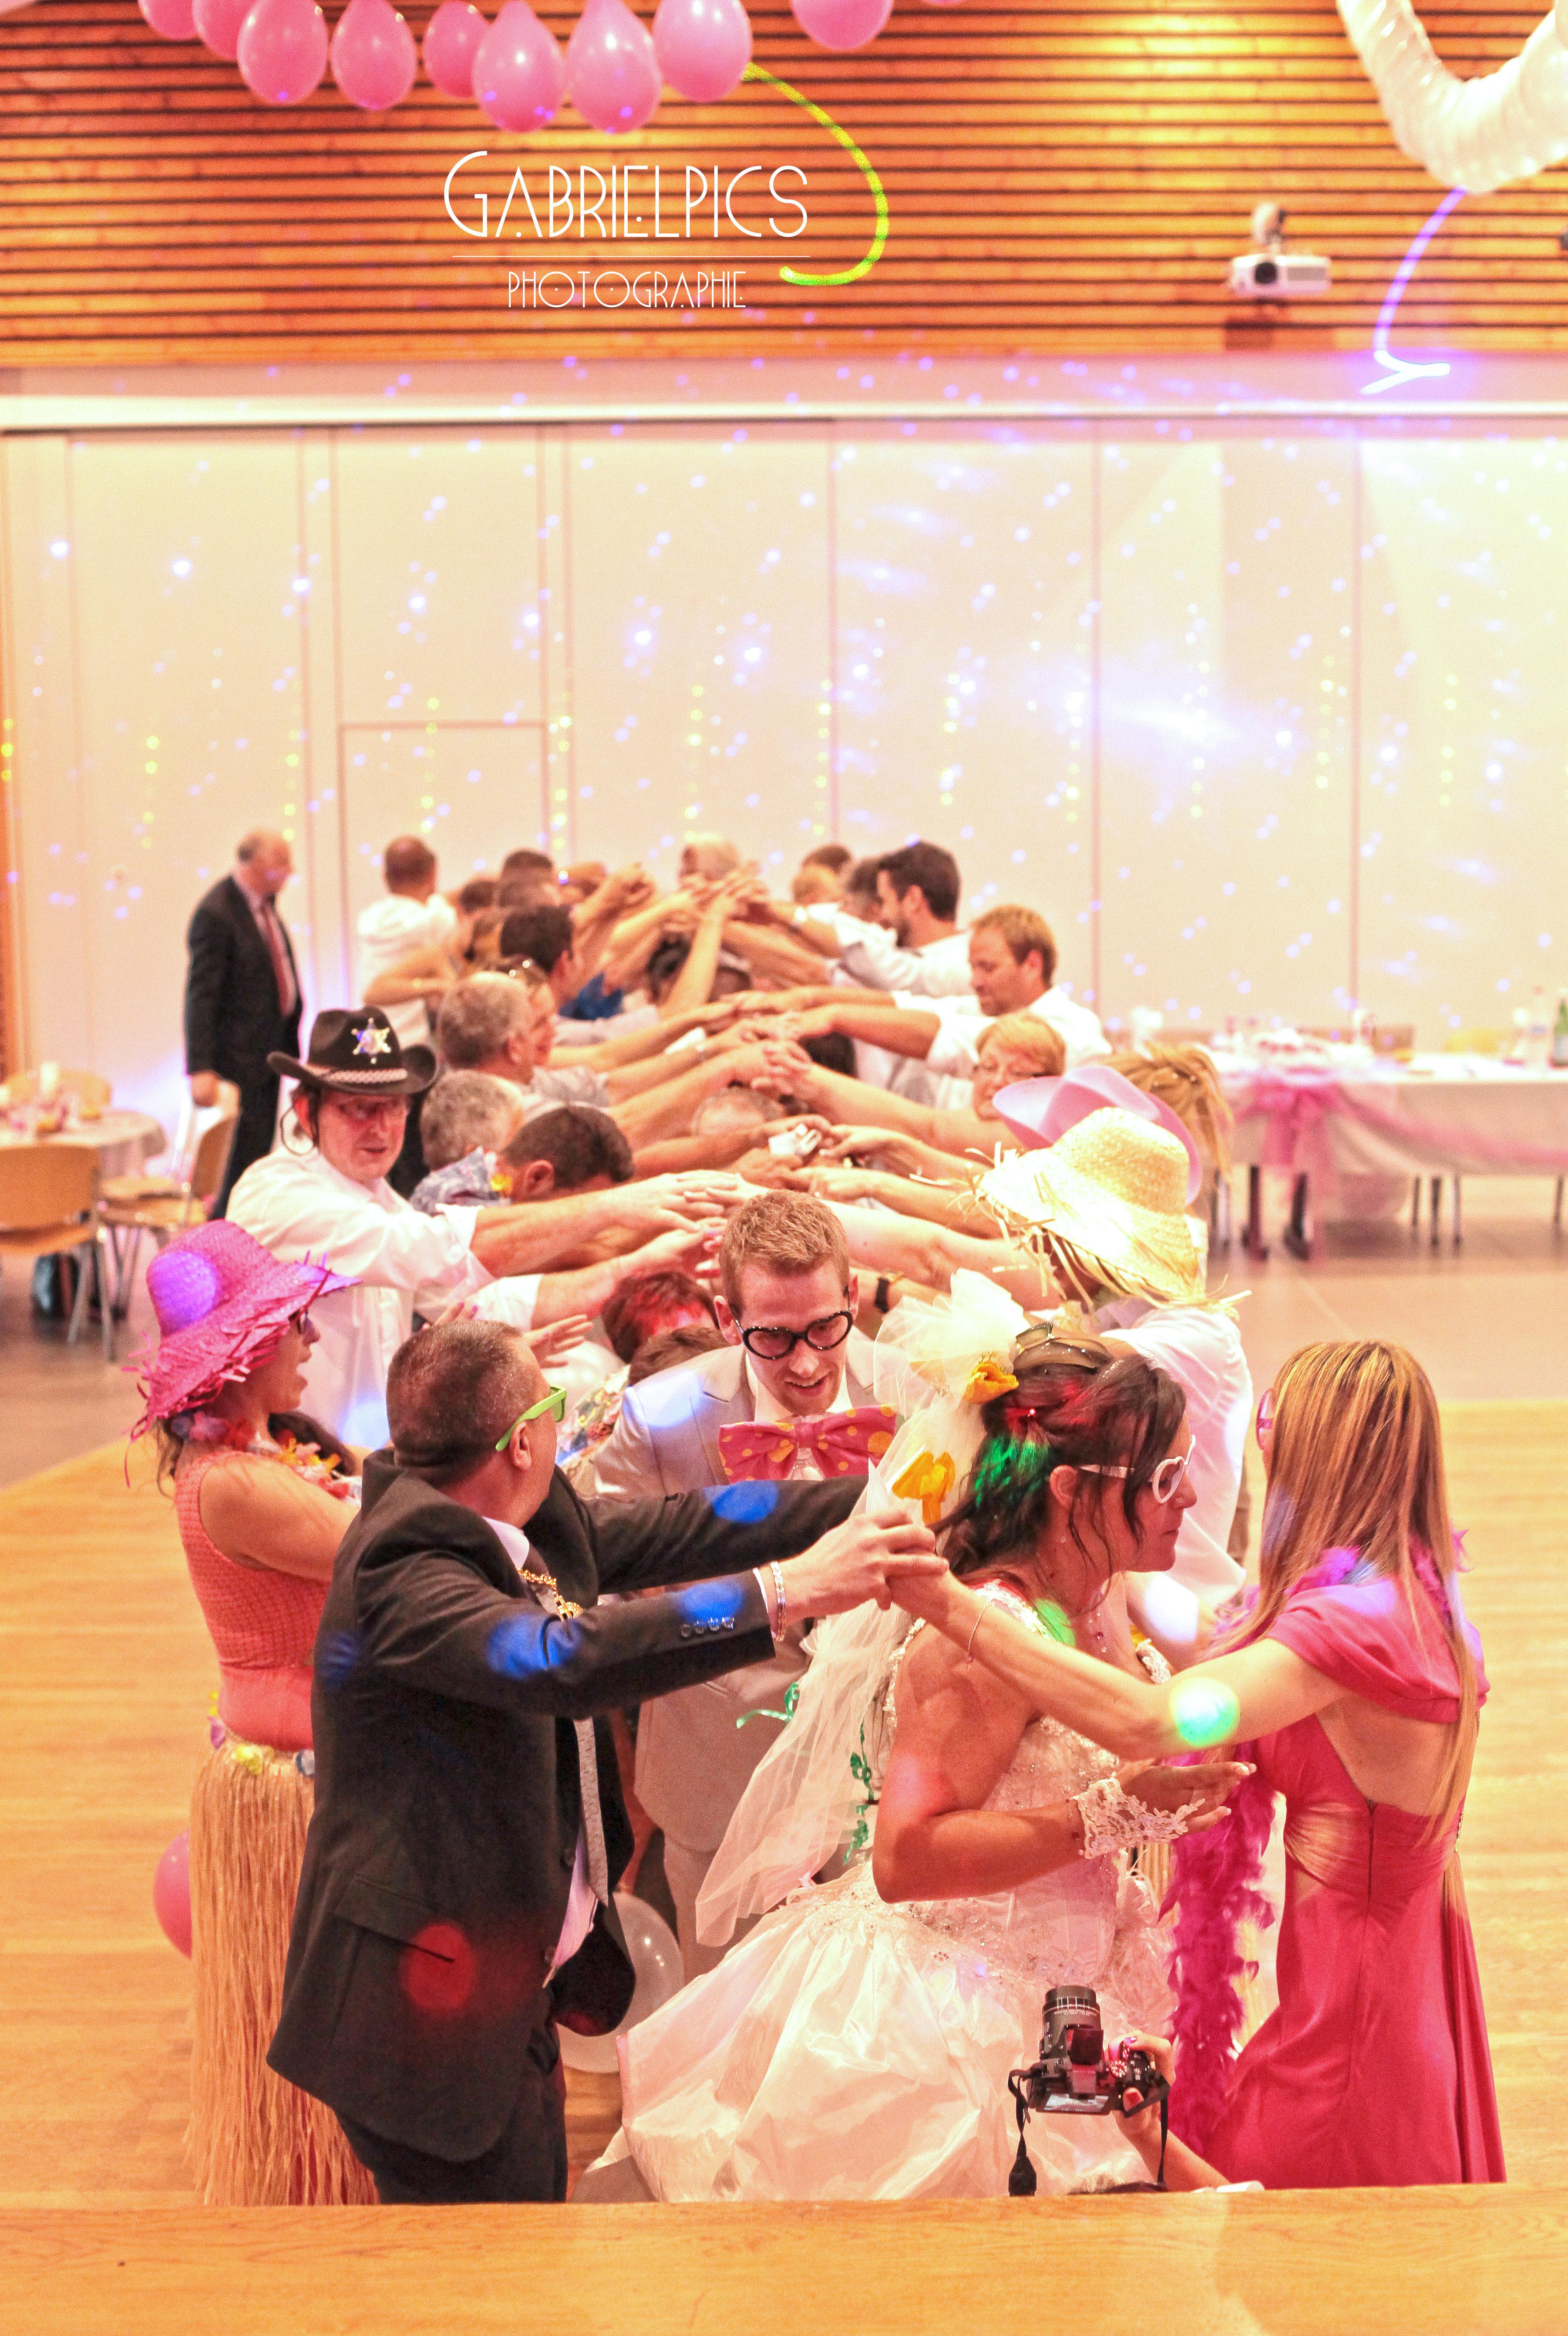 Gabrielpics photographie mariage juin 2015